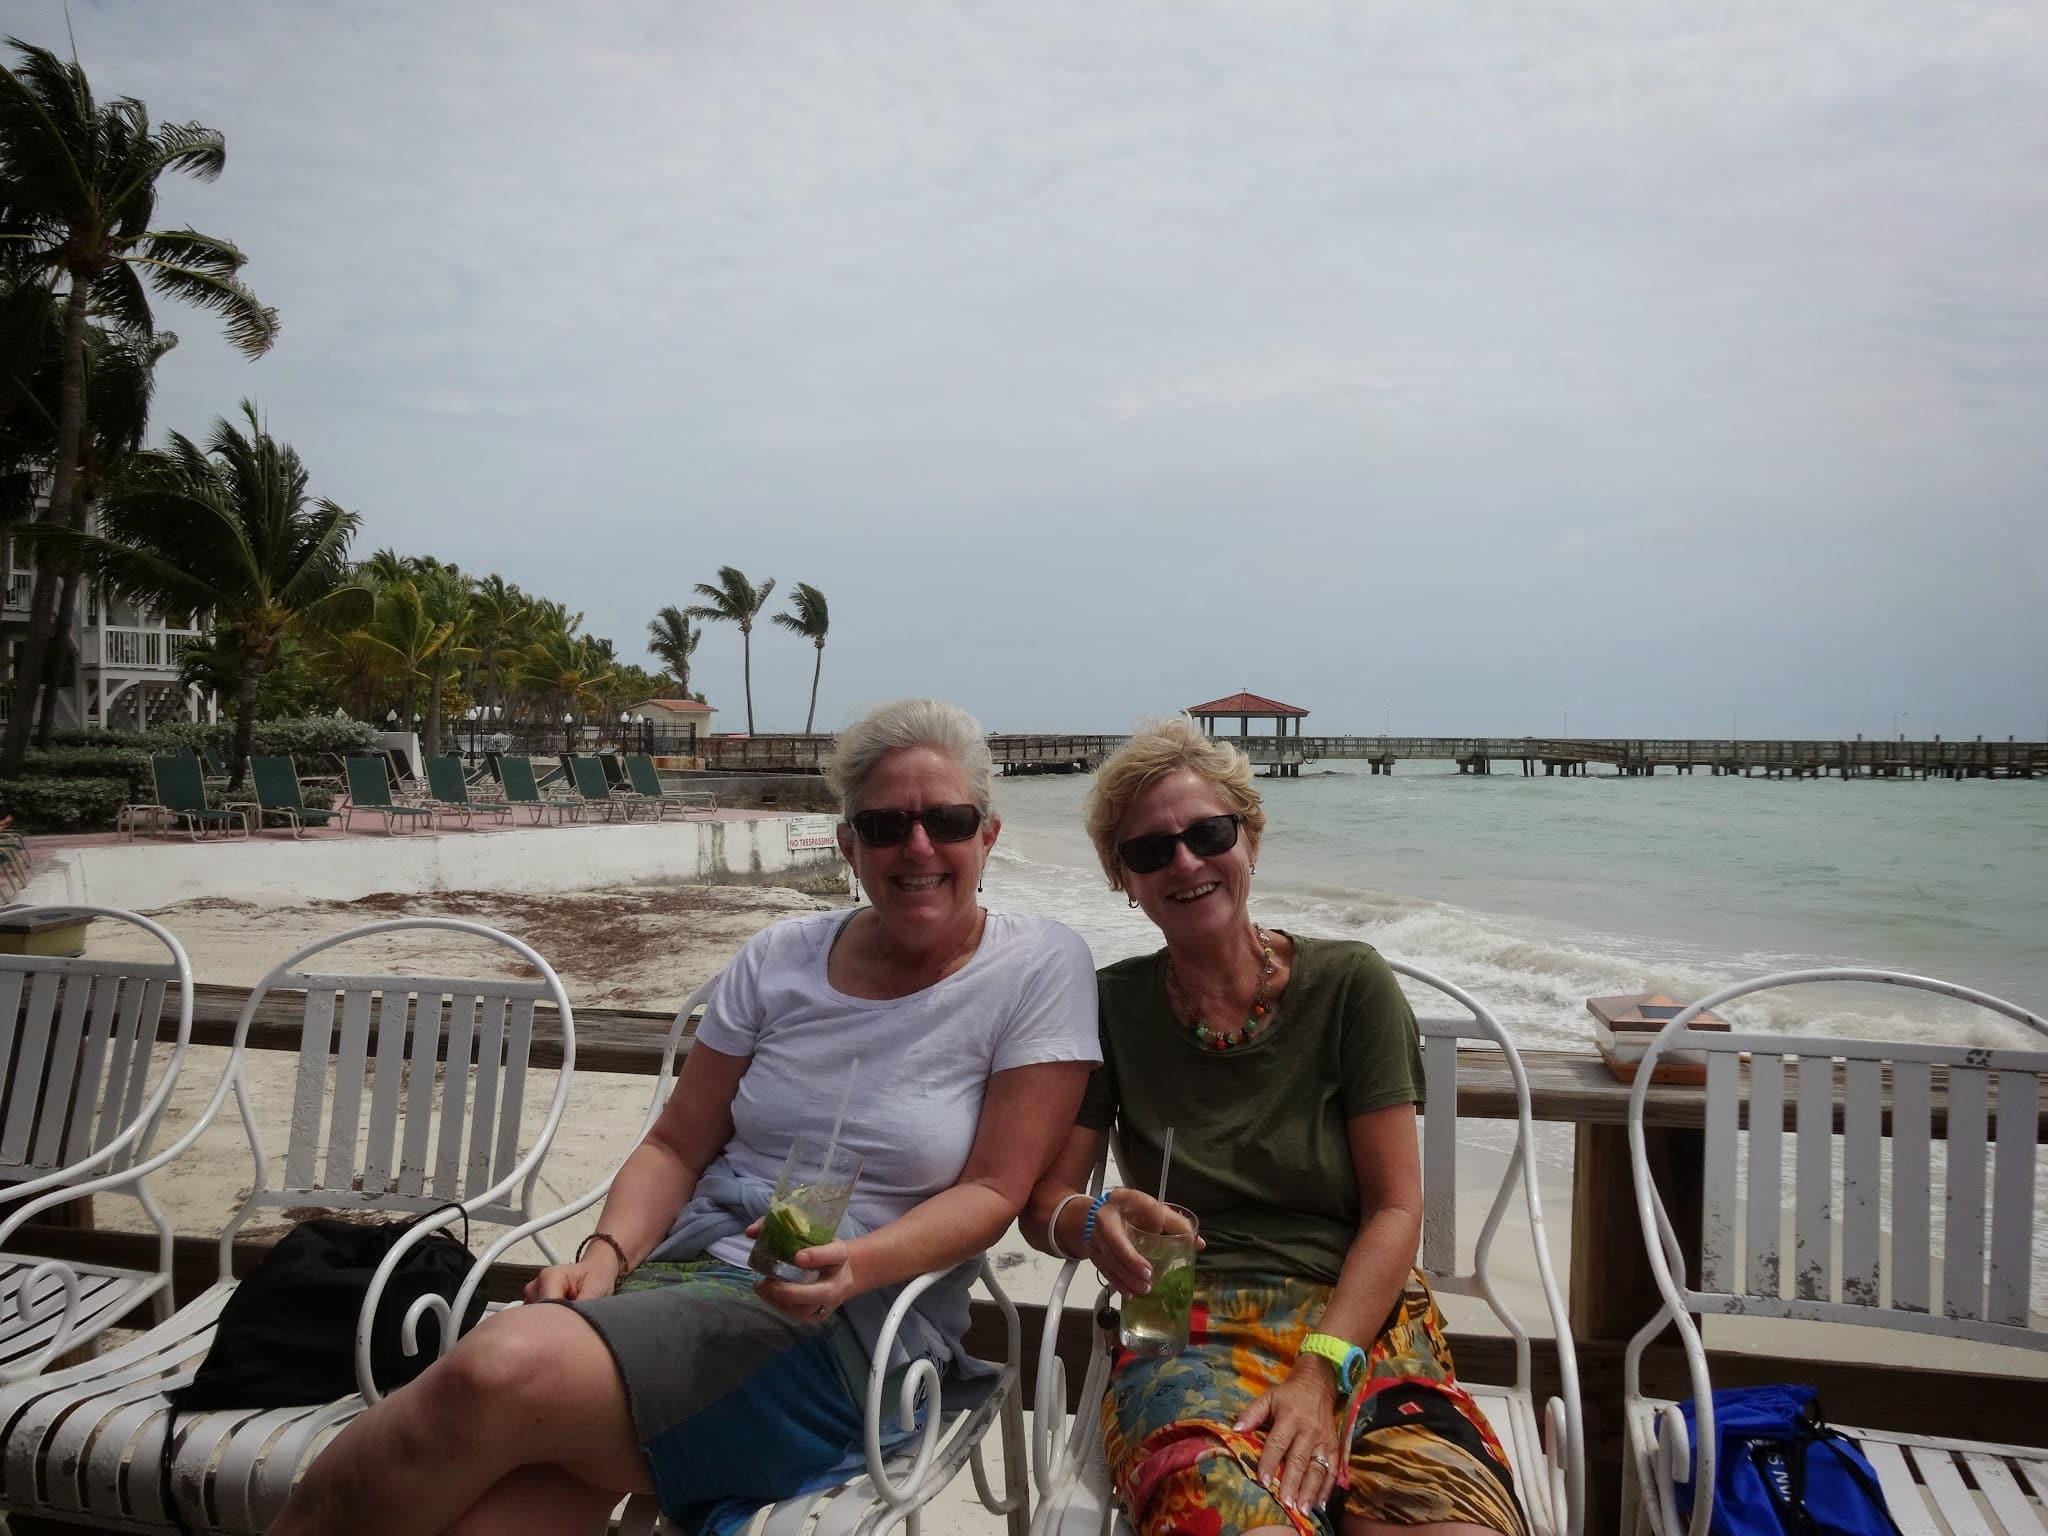 Backyard Restaurant Key West rare-finds-florida-key-west-conch-republic-louie's-backyard